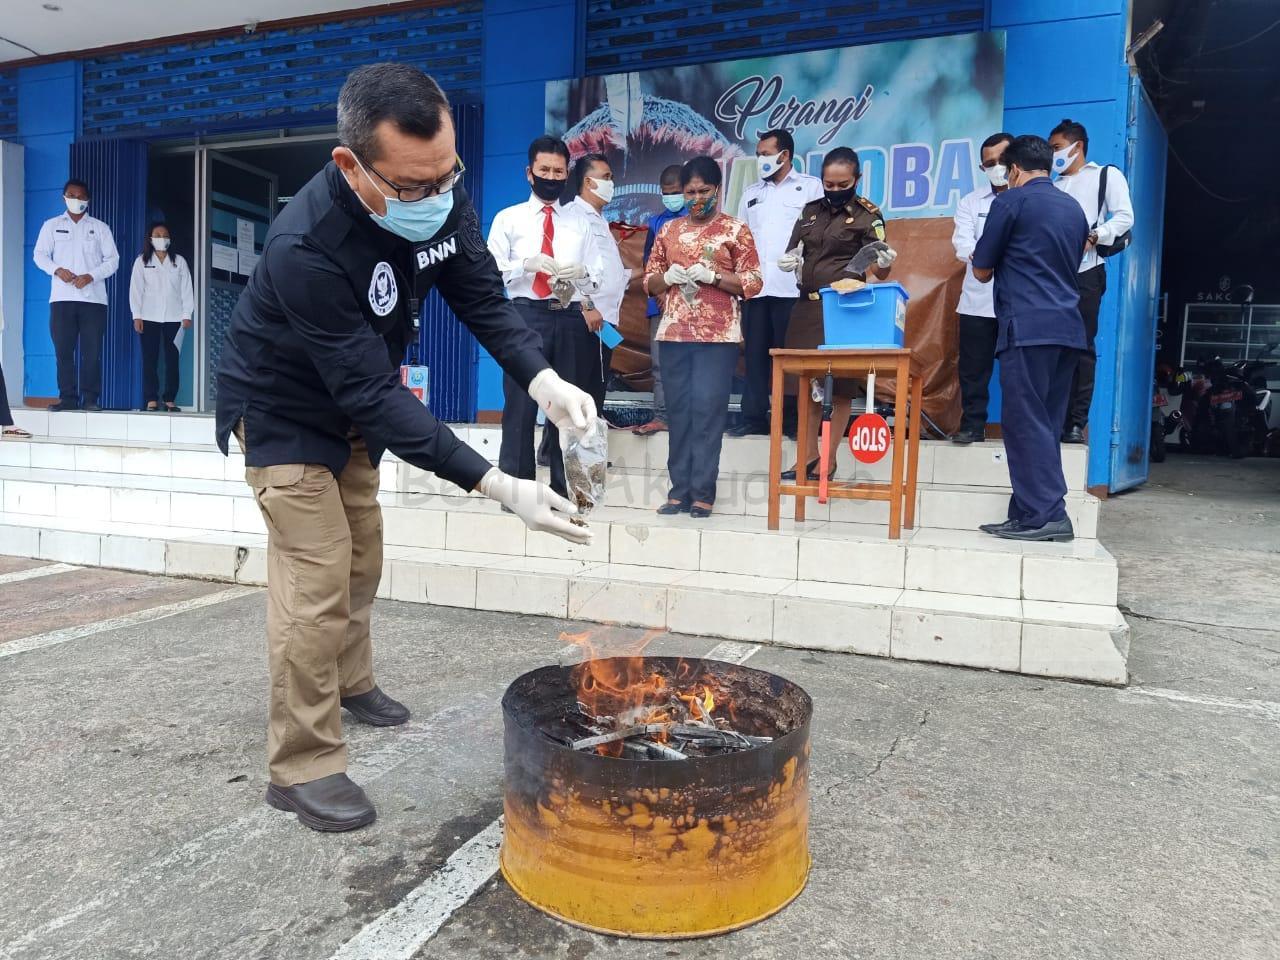 BNN Papua Barat Musnahkan 1.7 Kilogram Ganja 6 IMG 20200907 WA0030